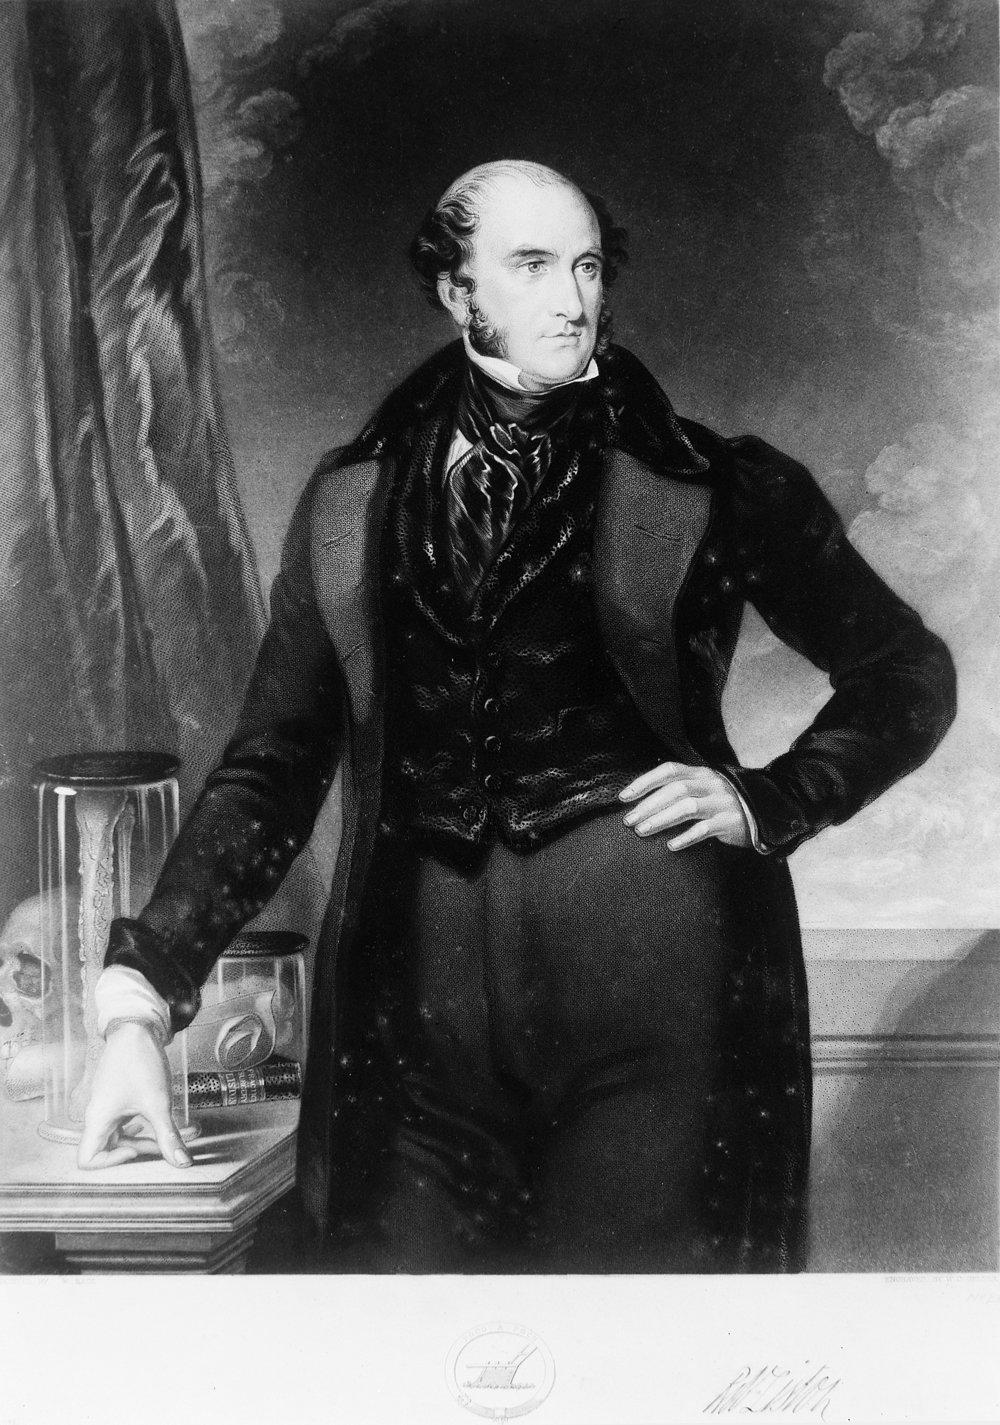 Robert_Liston._Mezzotint_by_W._O._Geller,_1841,_after_W._Bag_Wellcome_M0003286.jpg